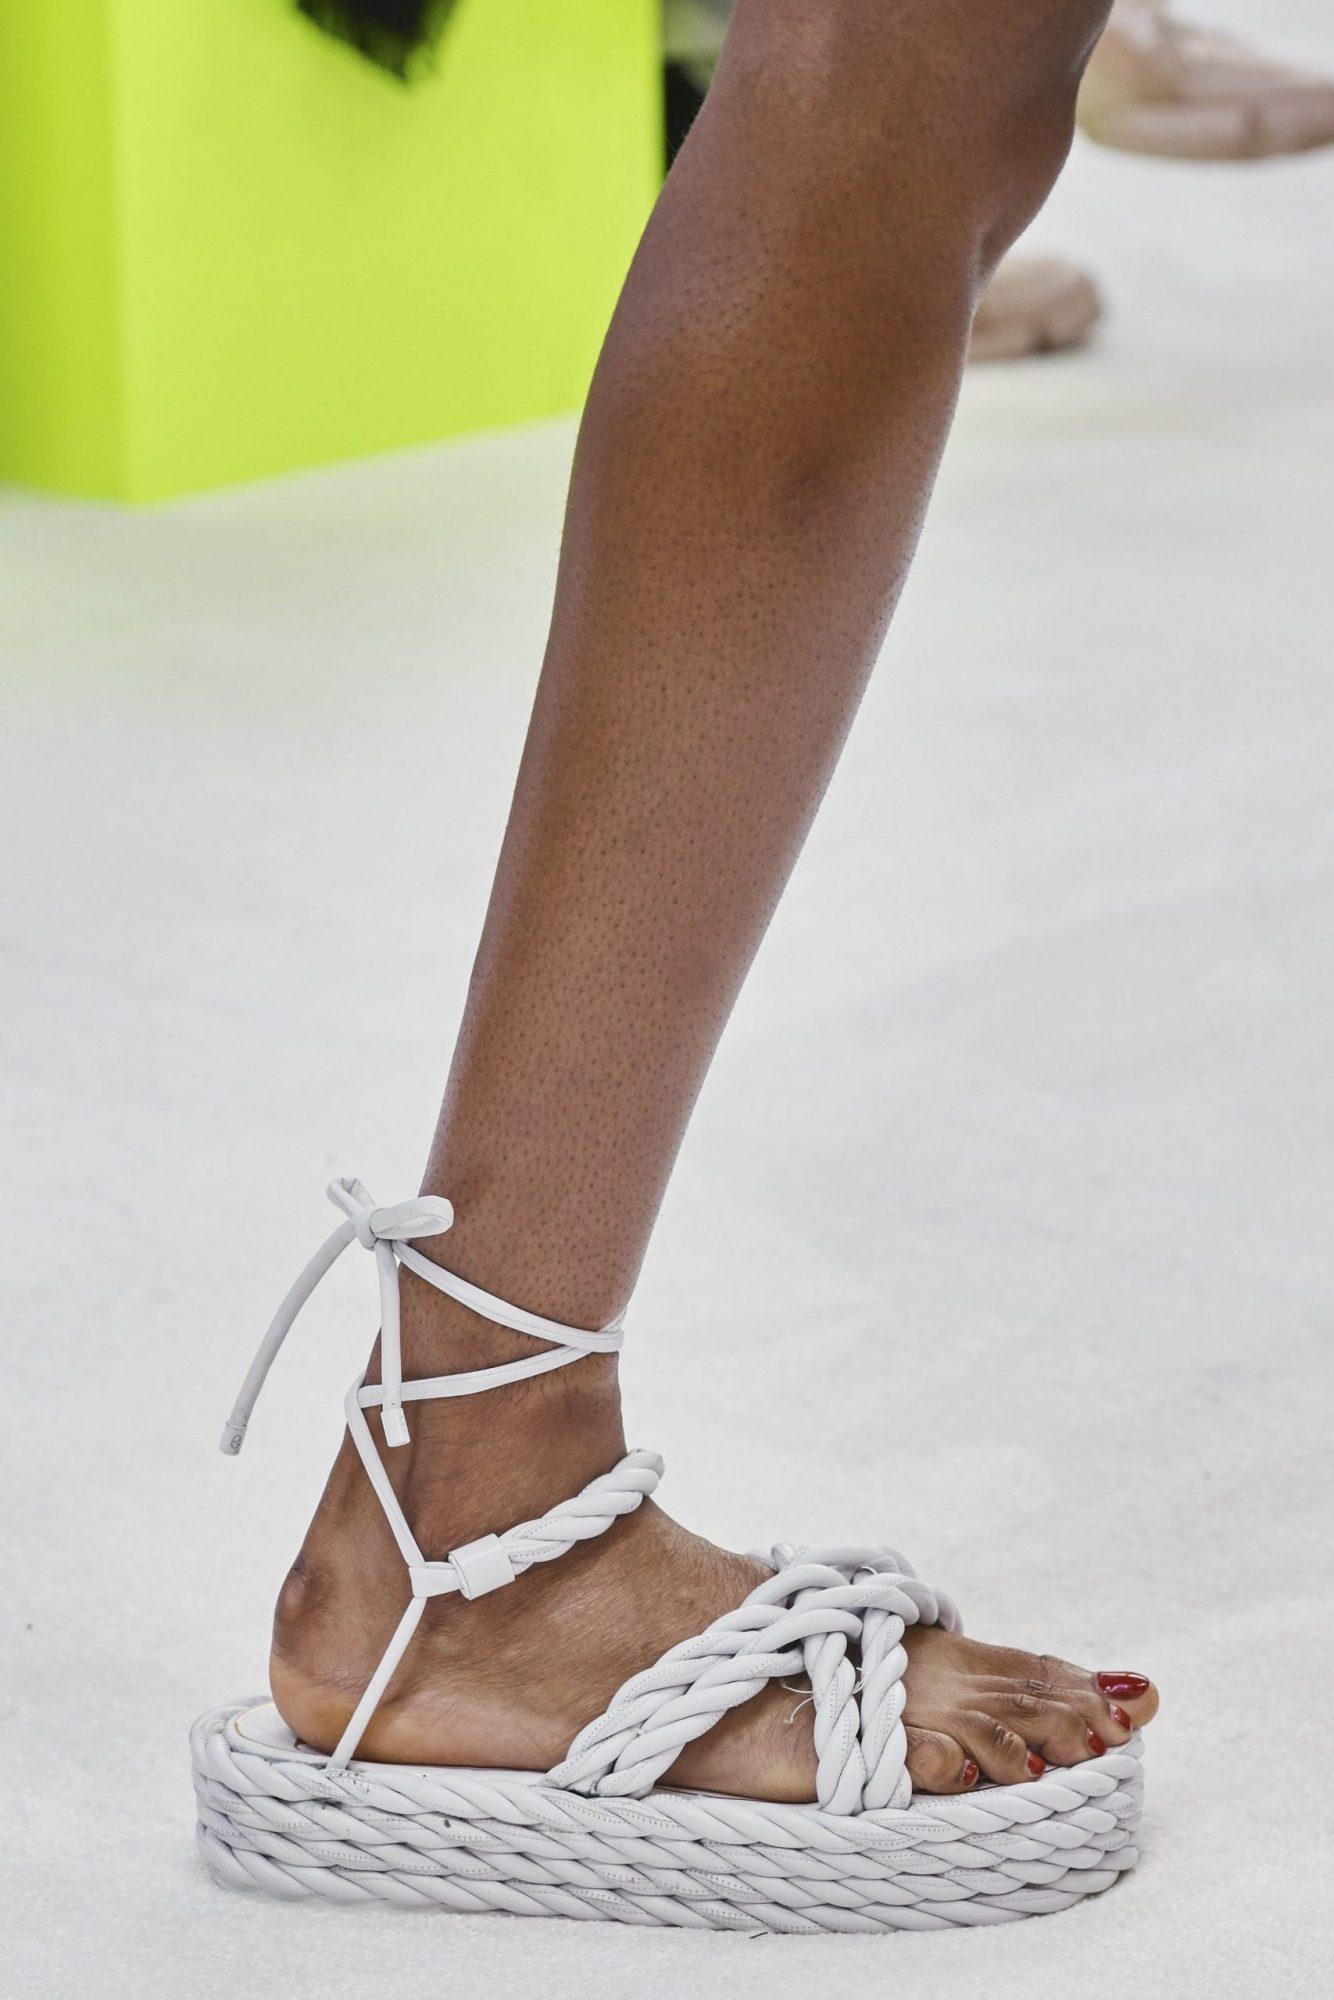 Rope Sandals: Είναι ό,τι πιο ωραίο έχουμε δει σε πέδιλο ή είναι η ιδέα μας; (+10 σχέδια τρέλα!)